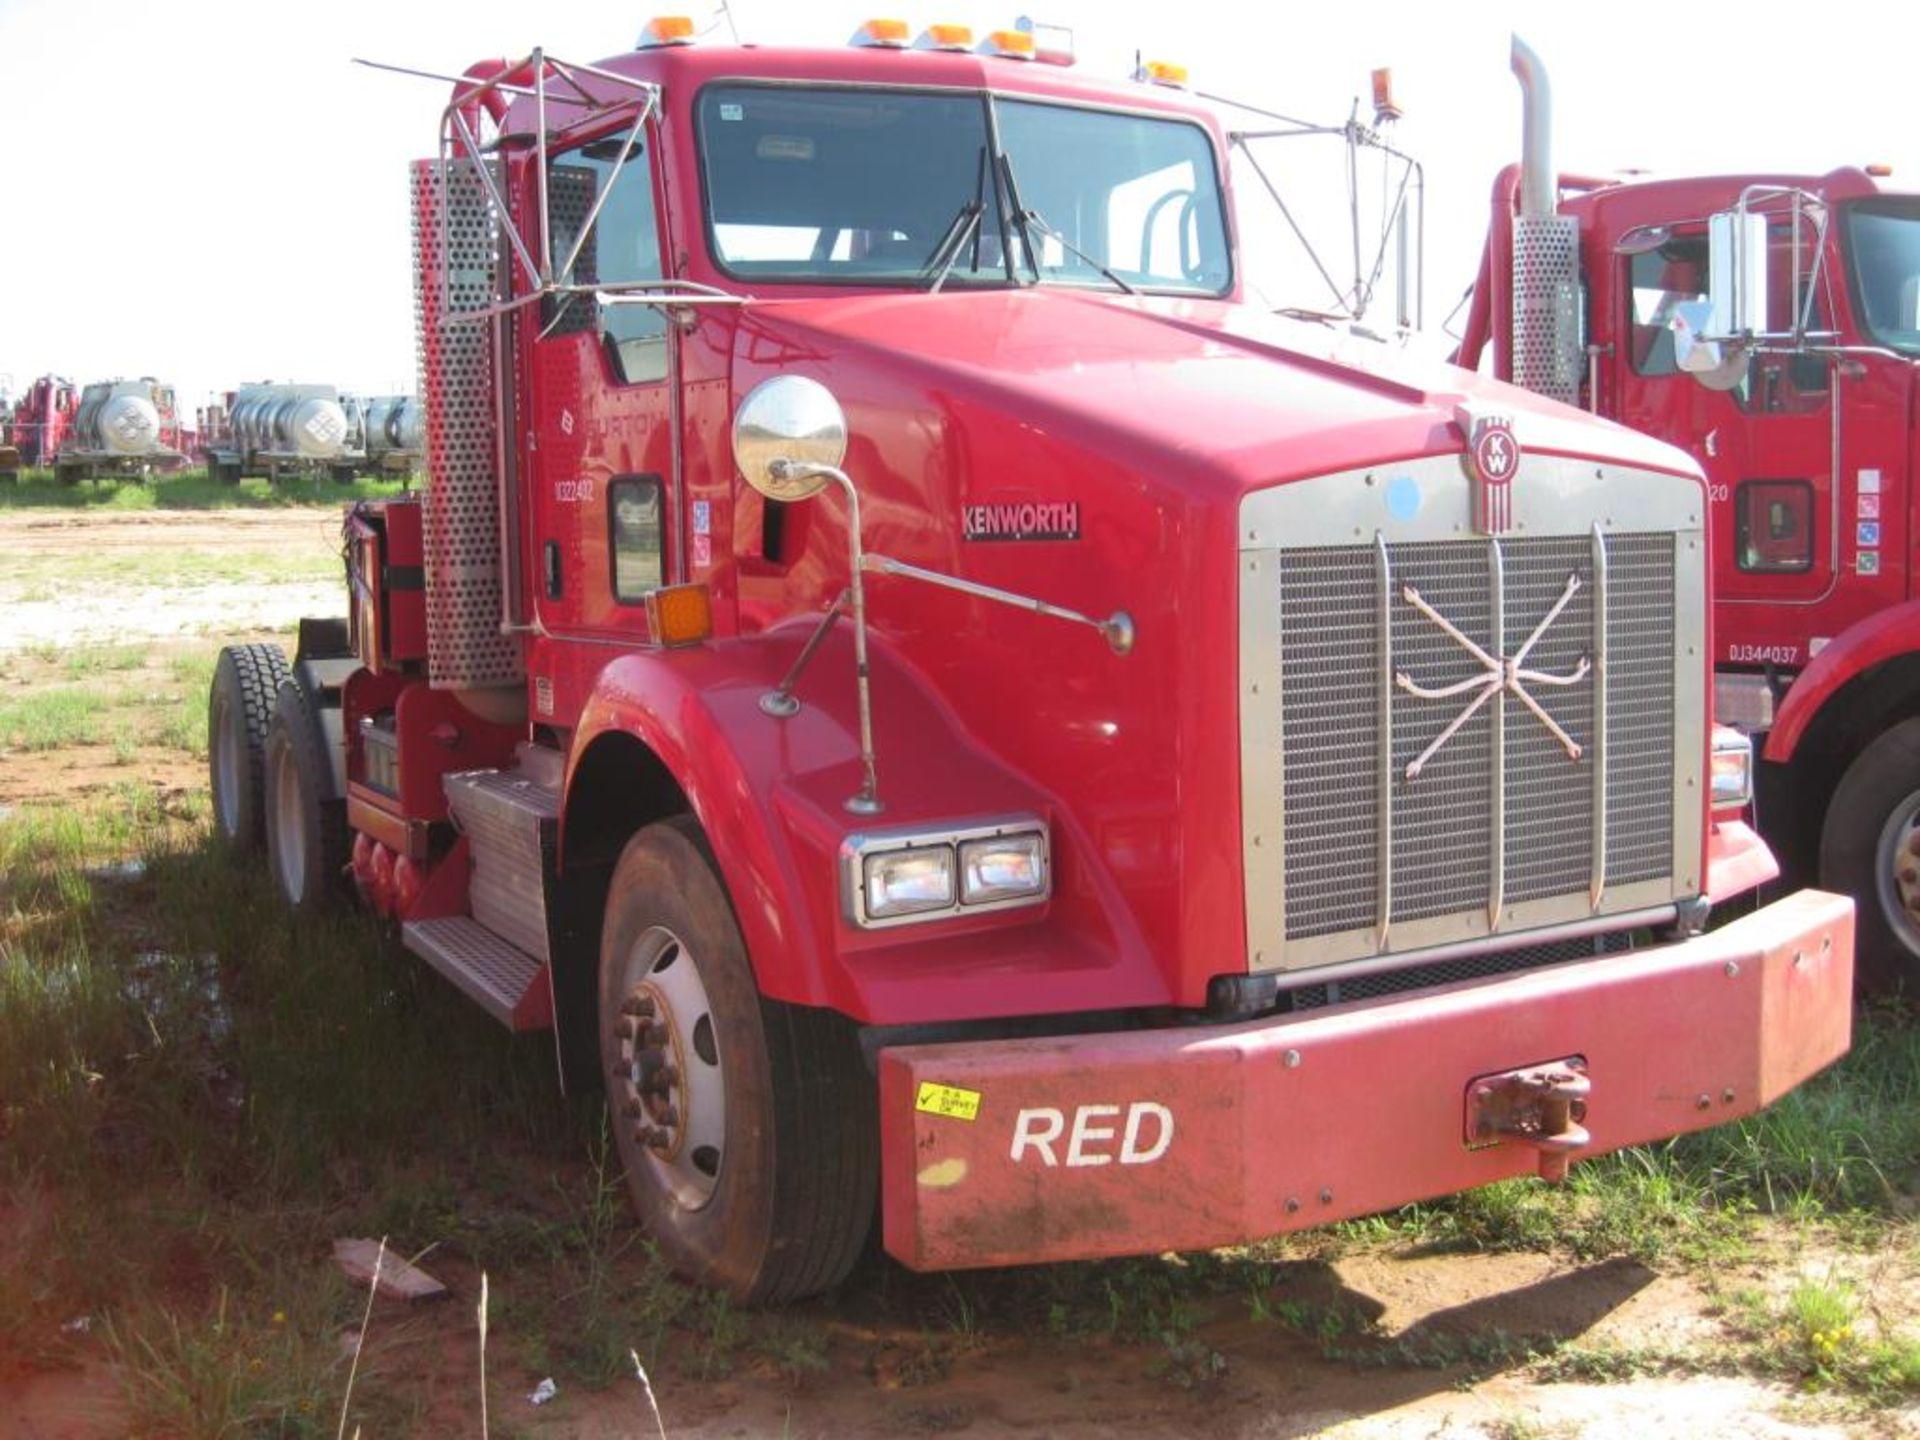 Kenworth Winch Truck - Image 2 of 27